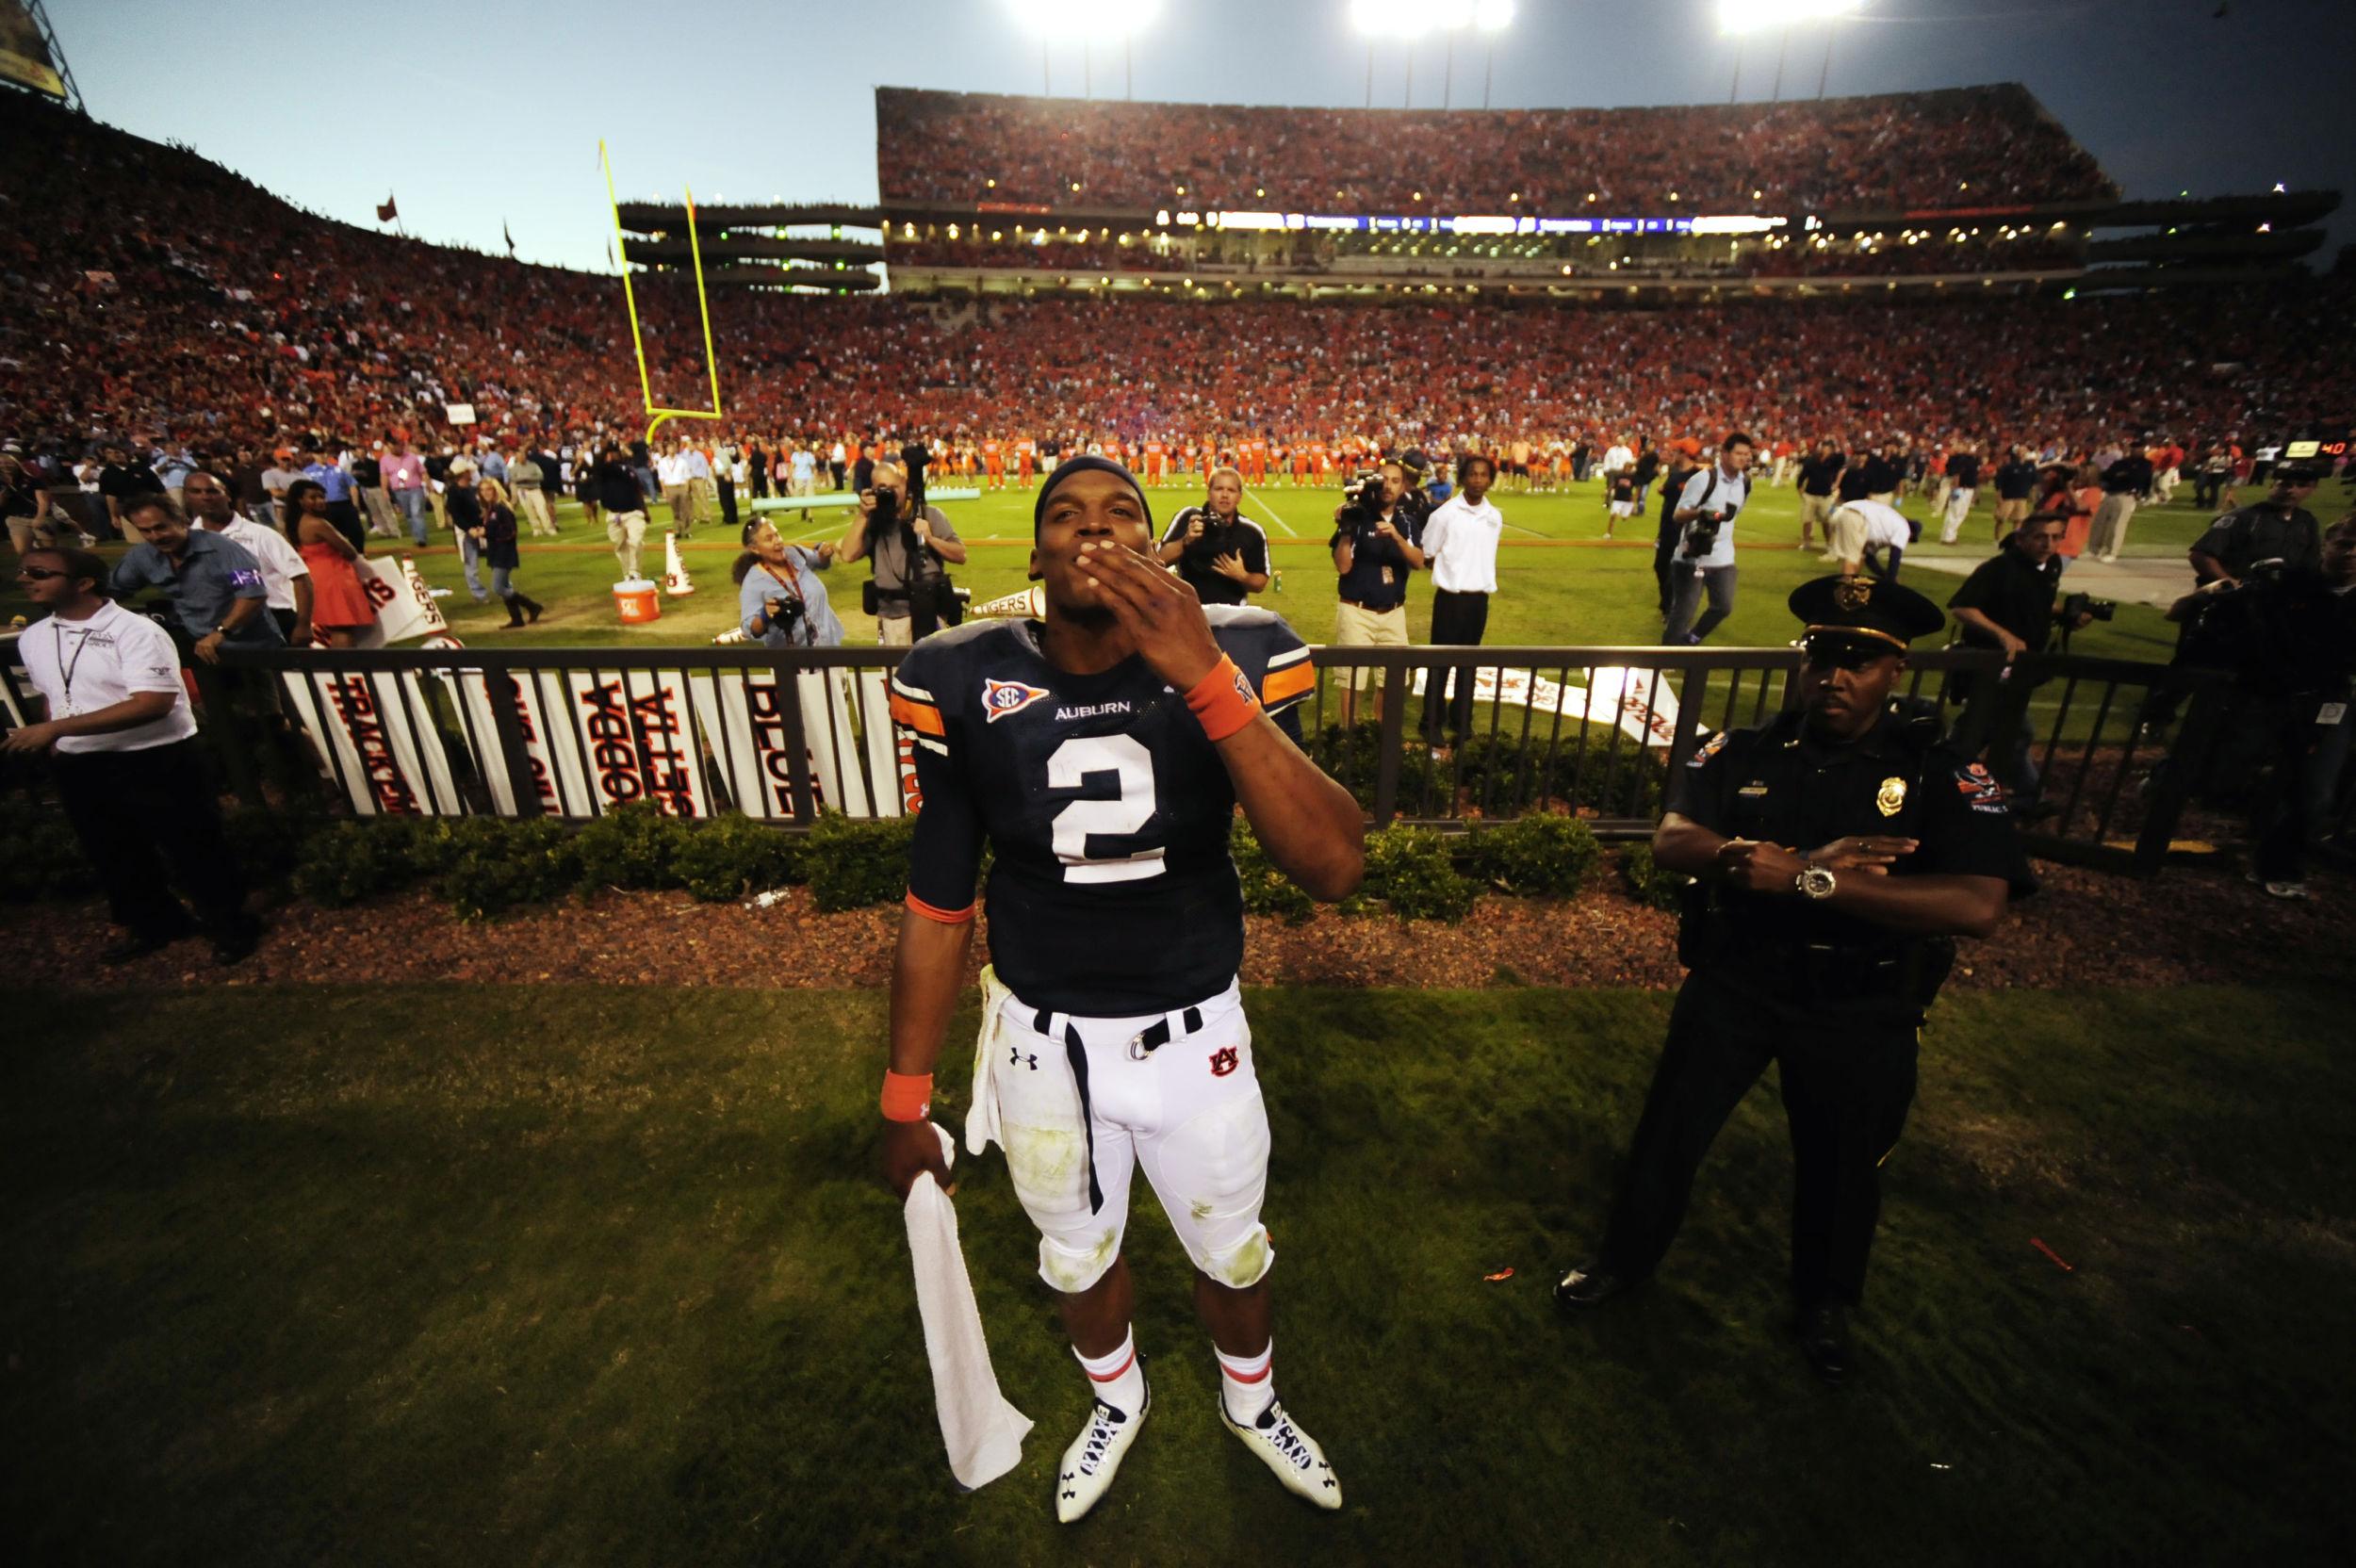 Auburn University Football quarterback